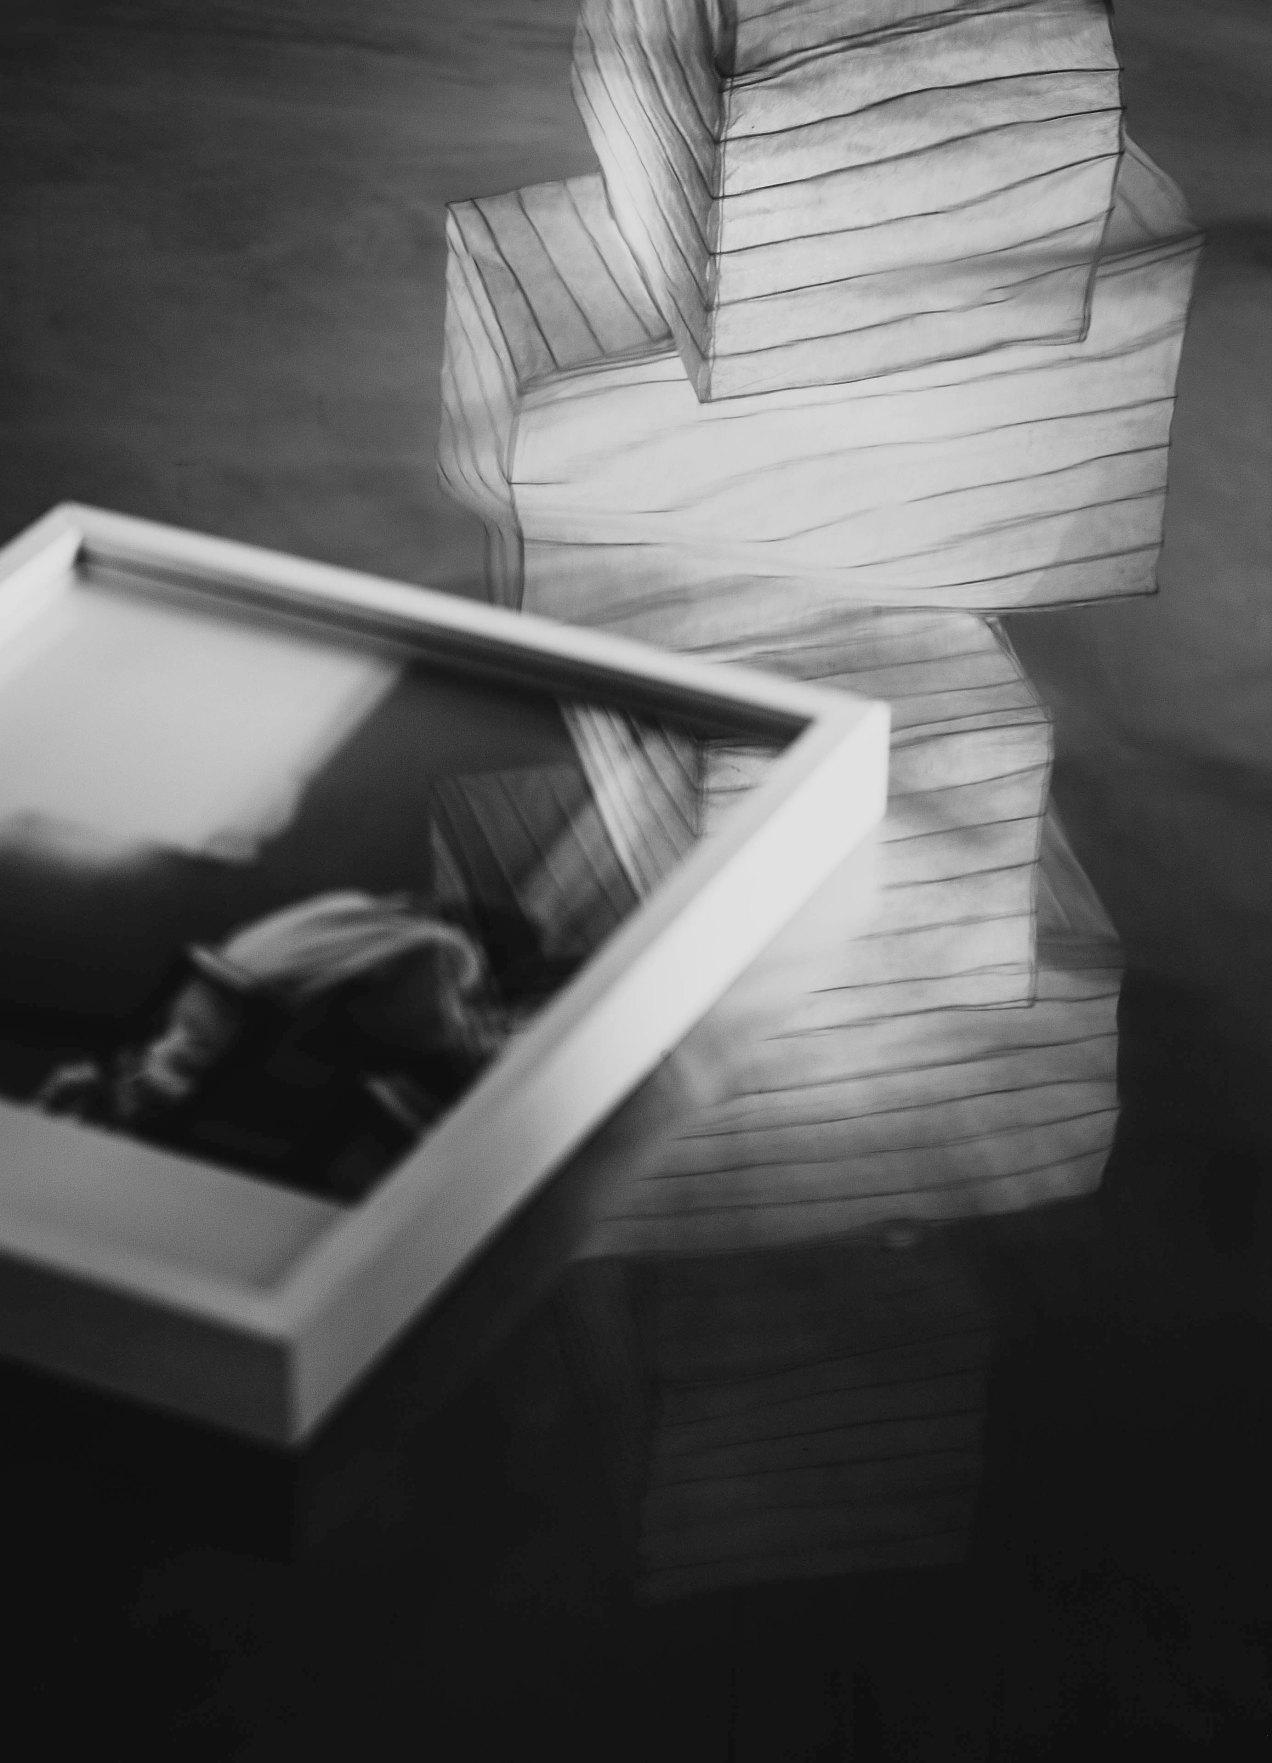 Nogushi, réflection, gildalliere, 2008